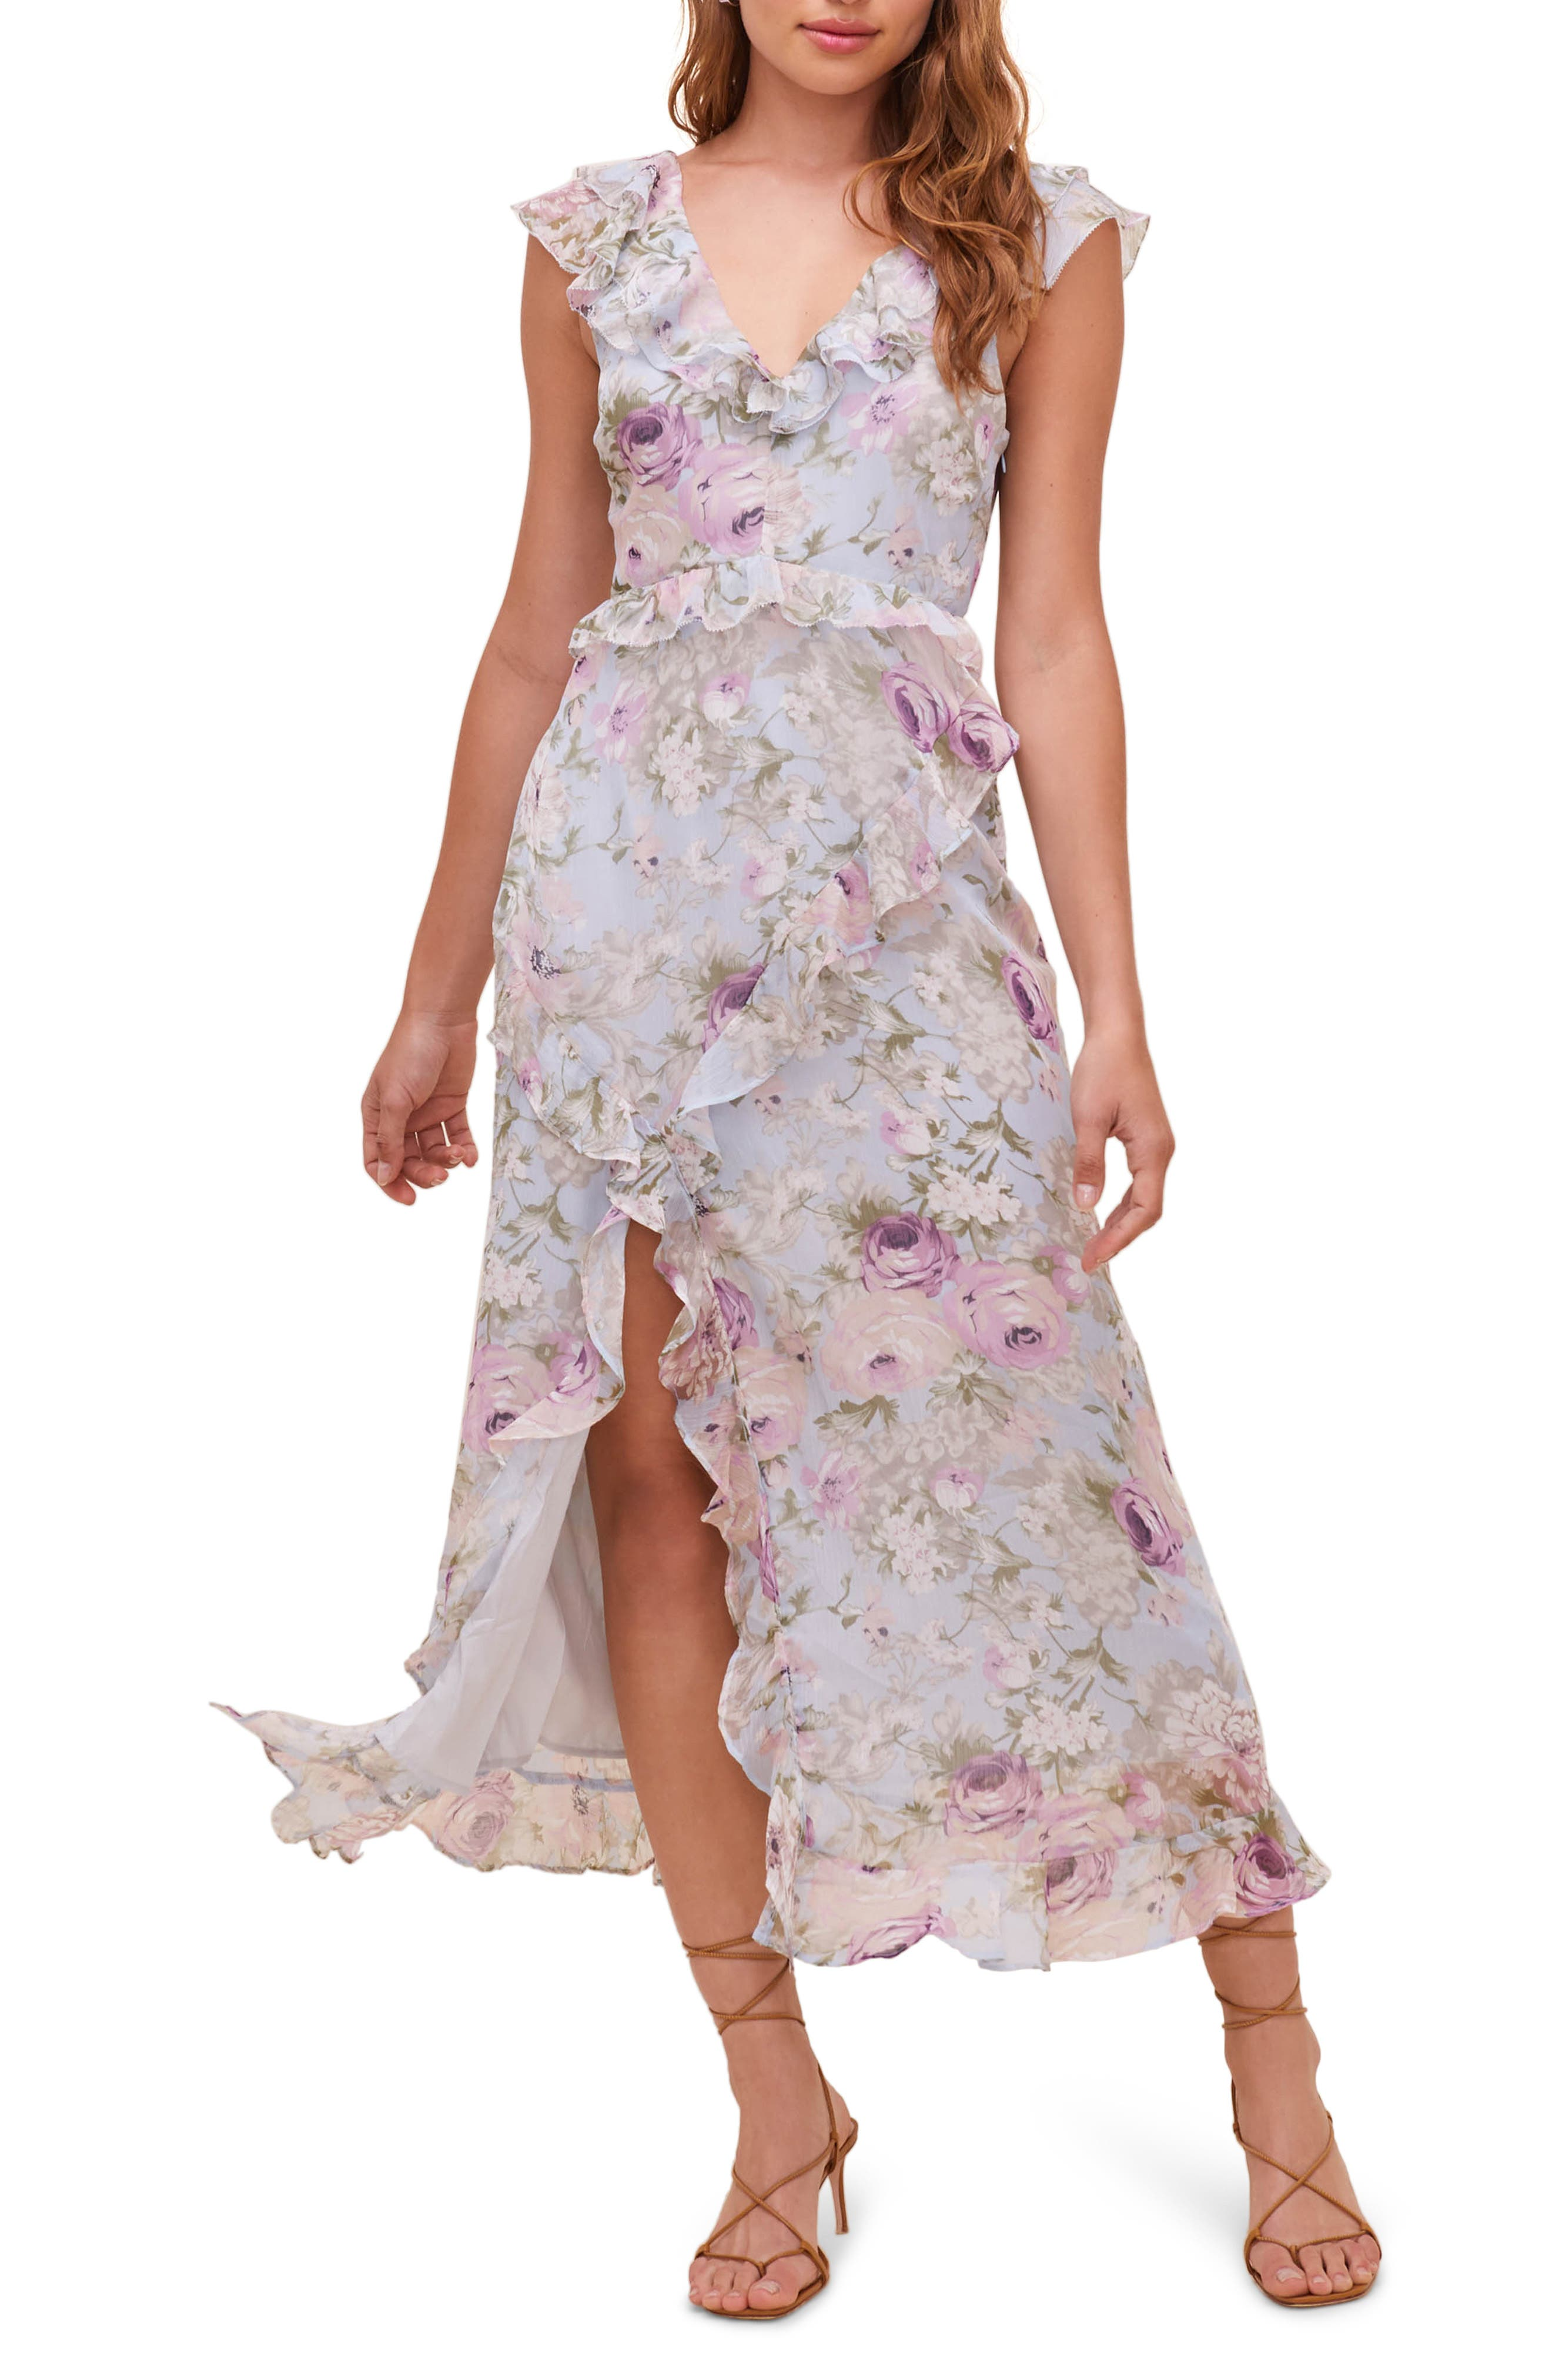 Tempest Floral Midi Dress